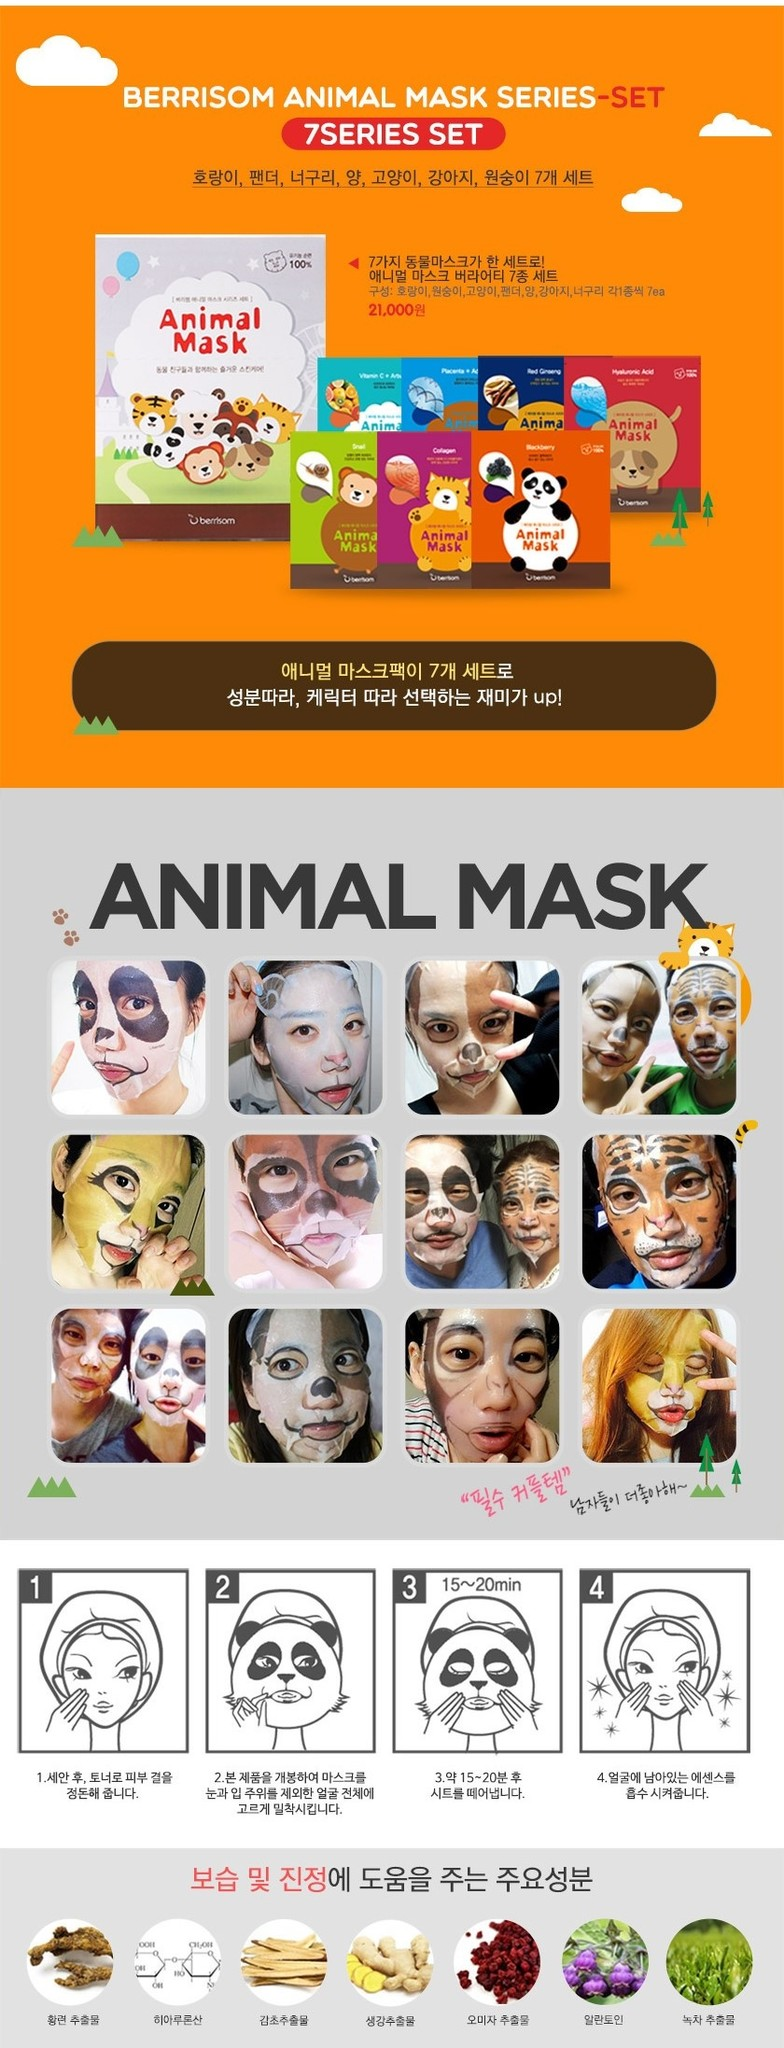 Animal Mask Series - Sheep-6